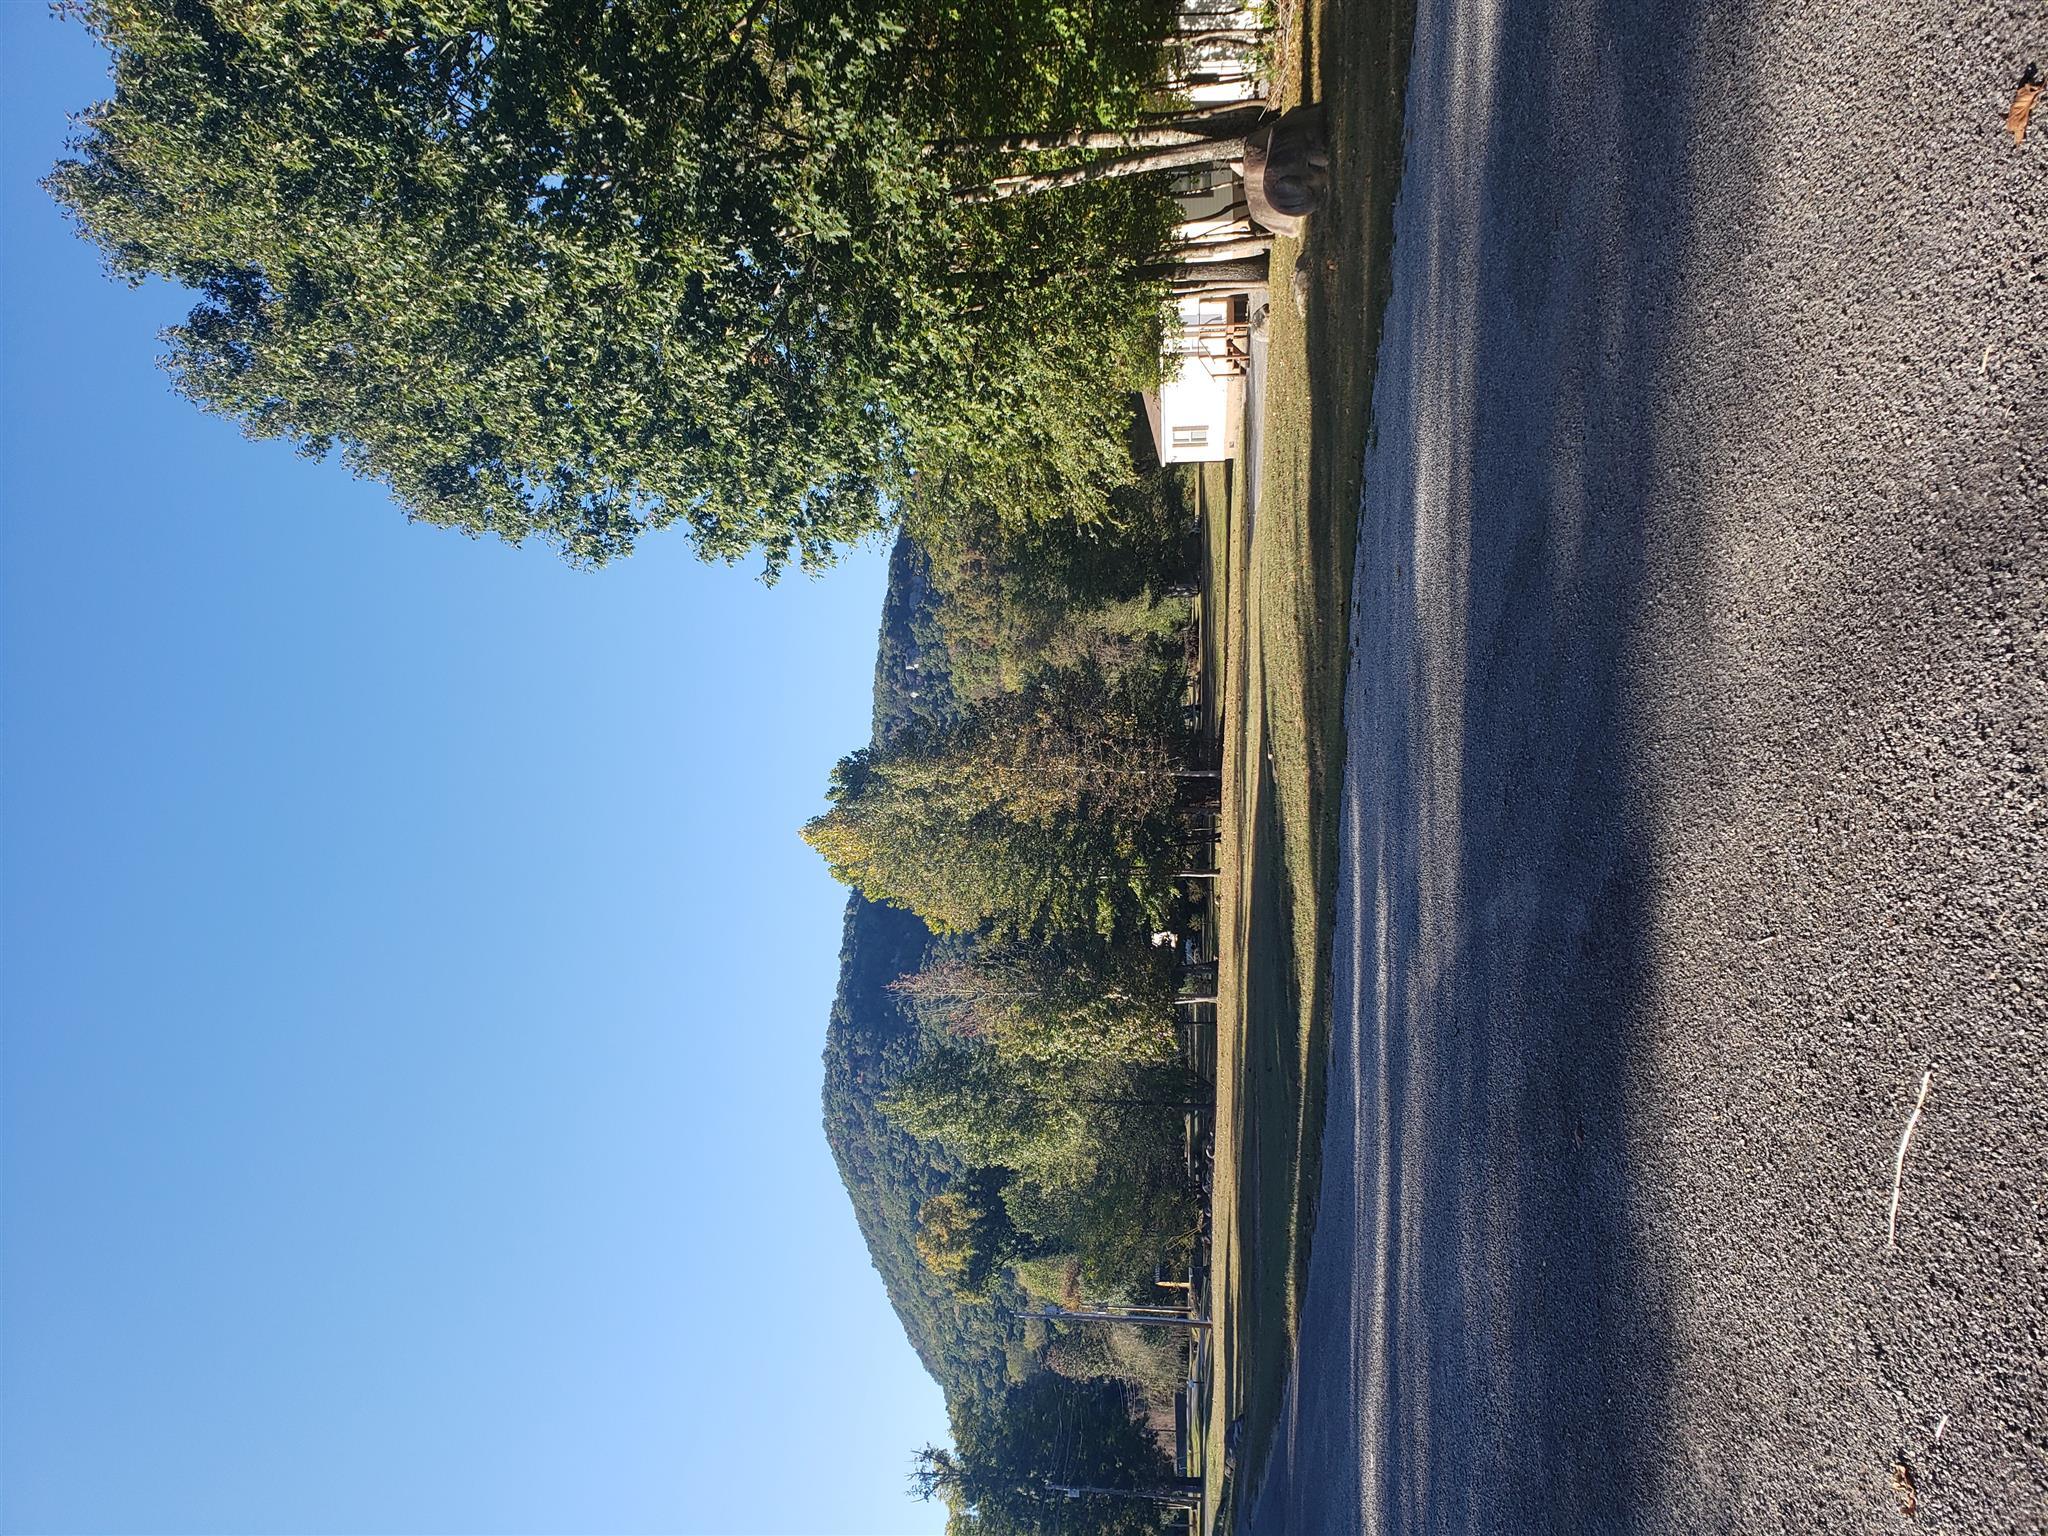 181 Valley Brook Rd, Dunlap, TN 37327 - Dunlap, TN real estate listing